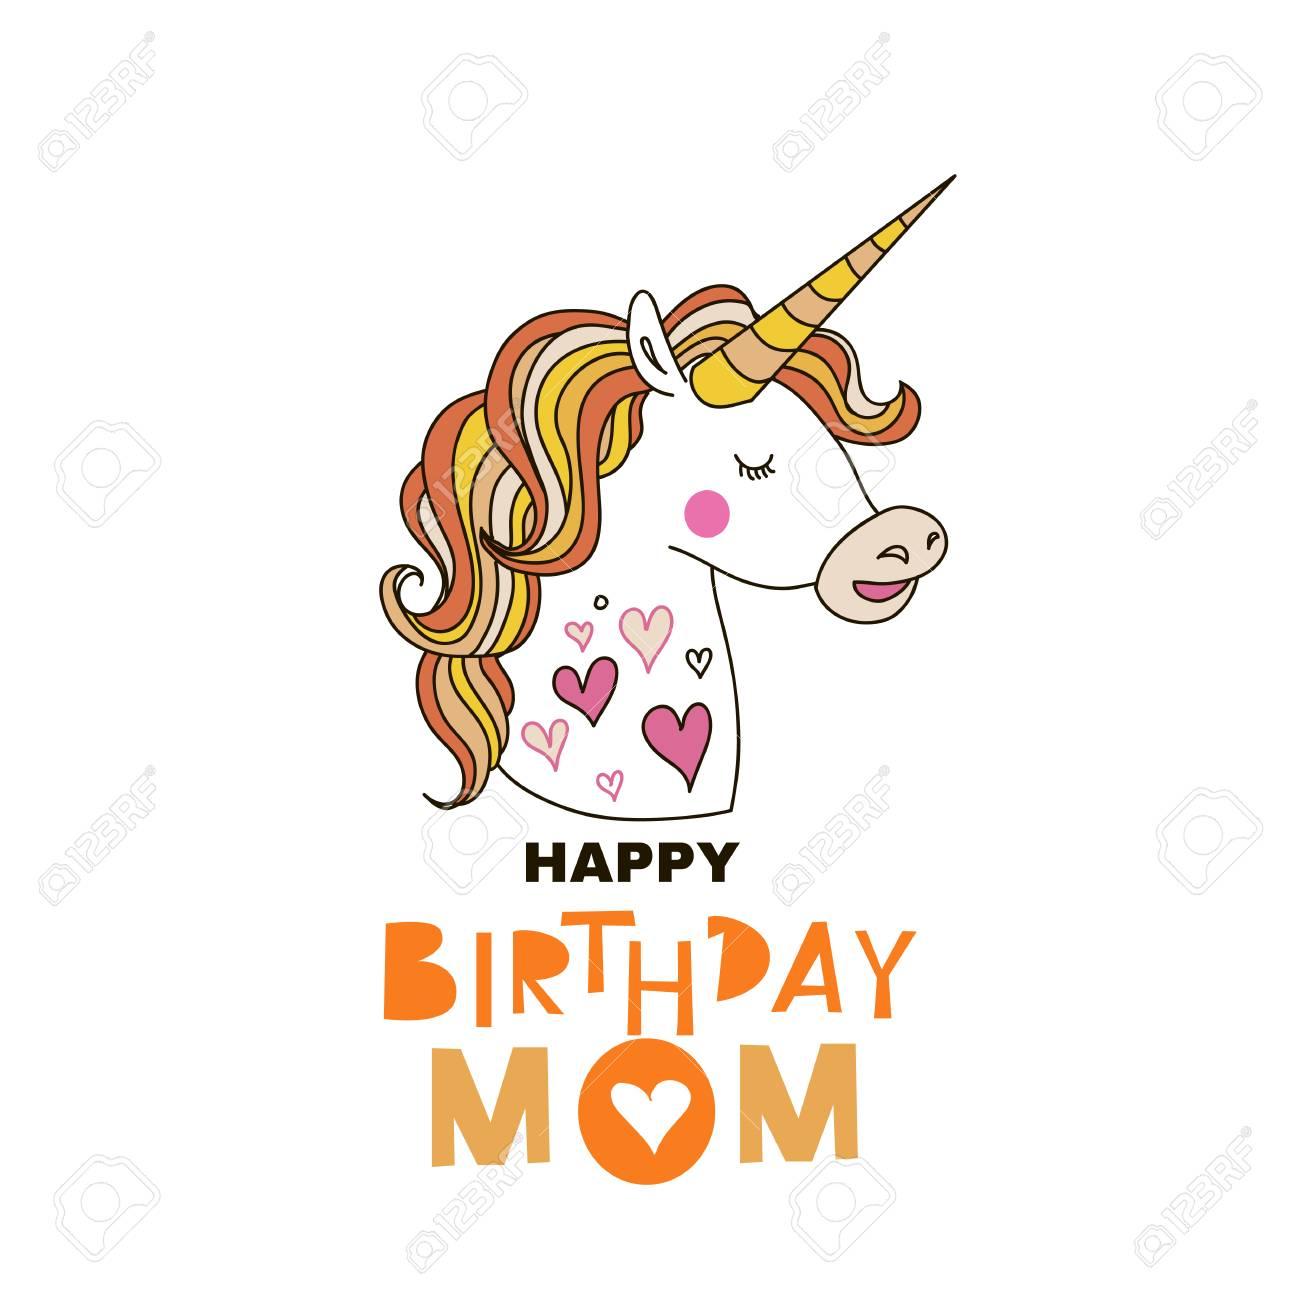 Happy Birthday Birthday Greeting Card Design D Ute Hand Drawn